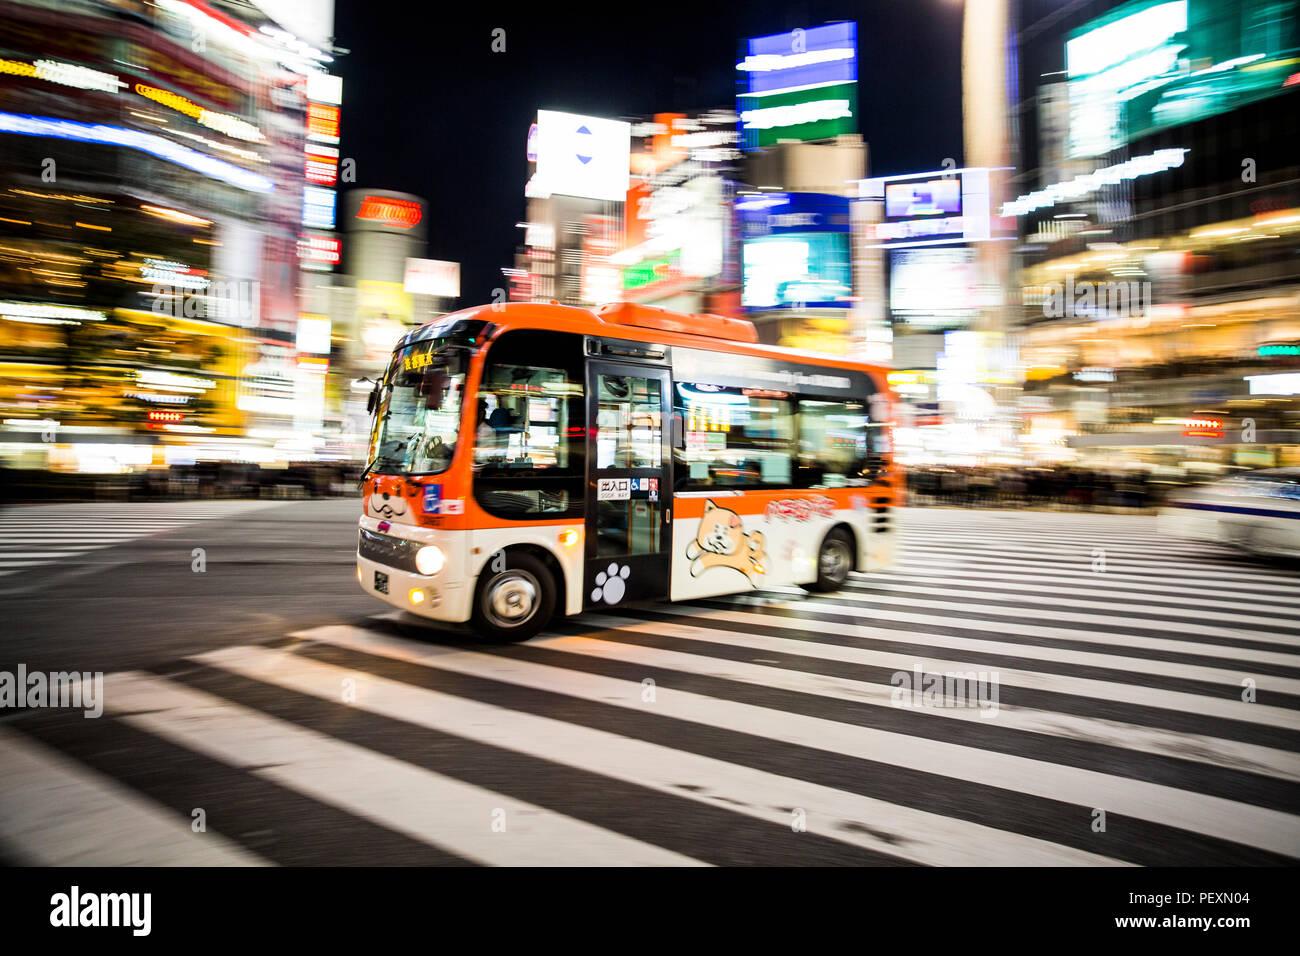 Shibuya Crossing in Tokyo, Japan - Stock Image